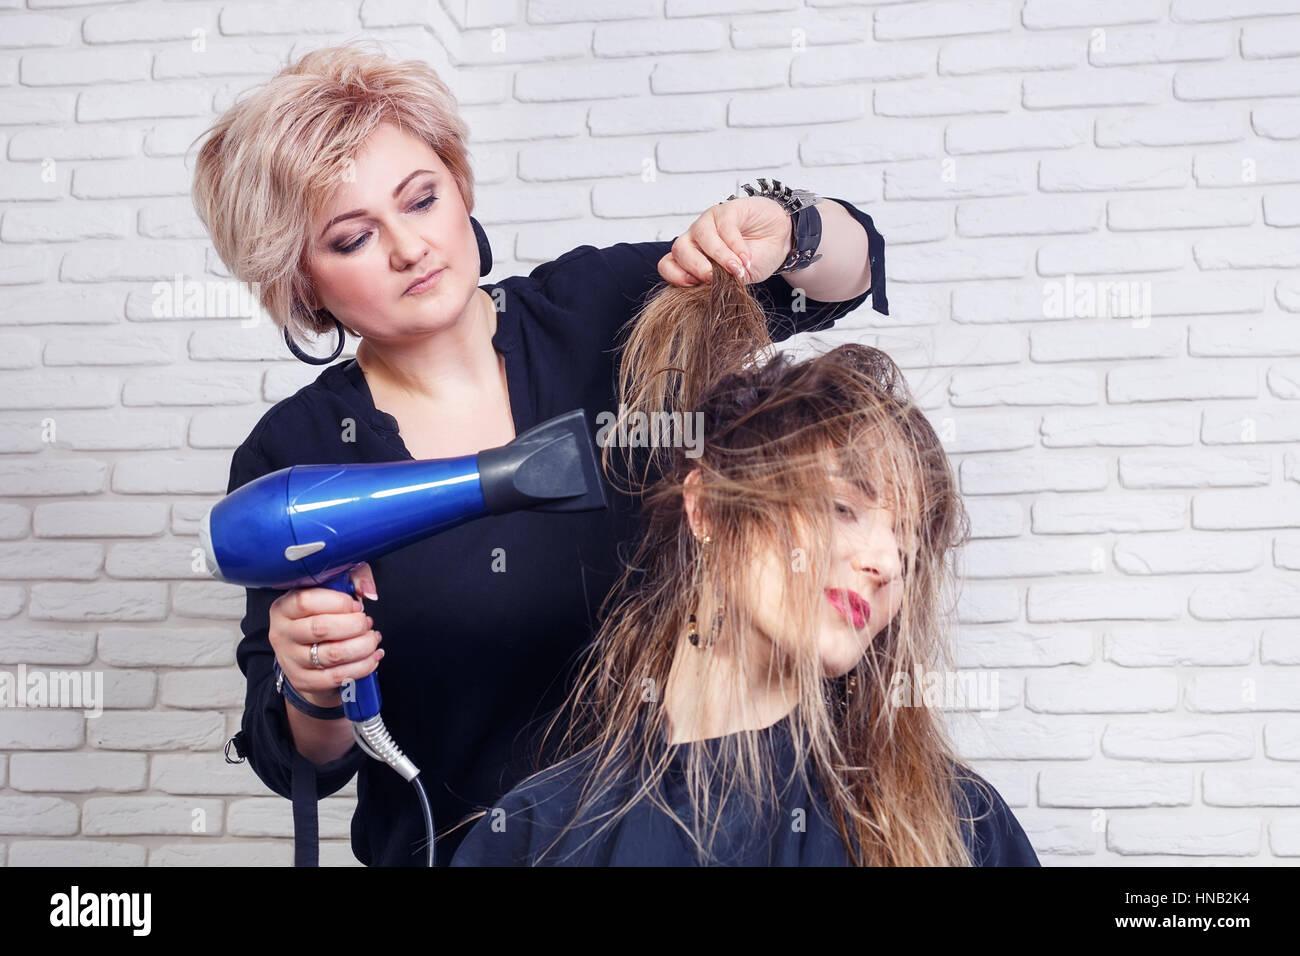 Friseur trocknen Haare Stockbild